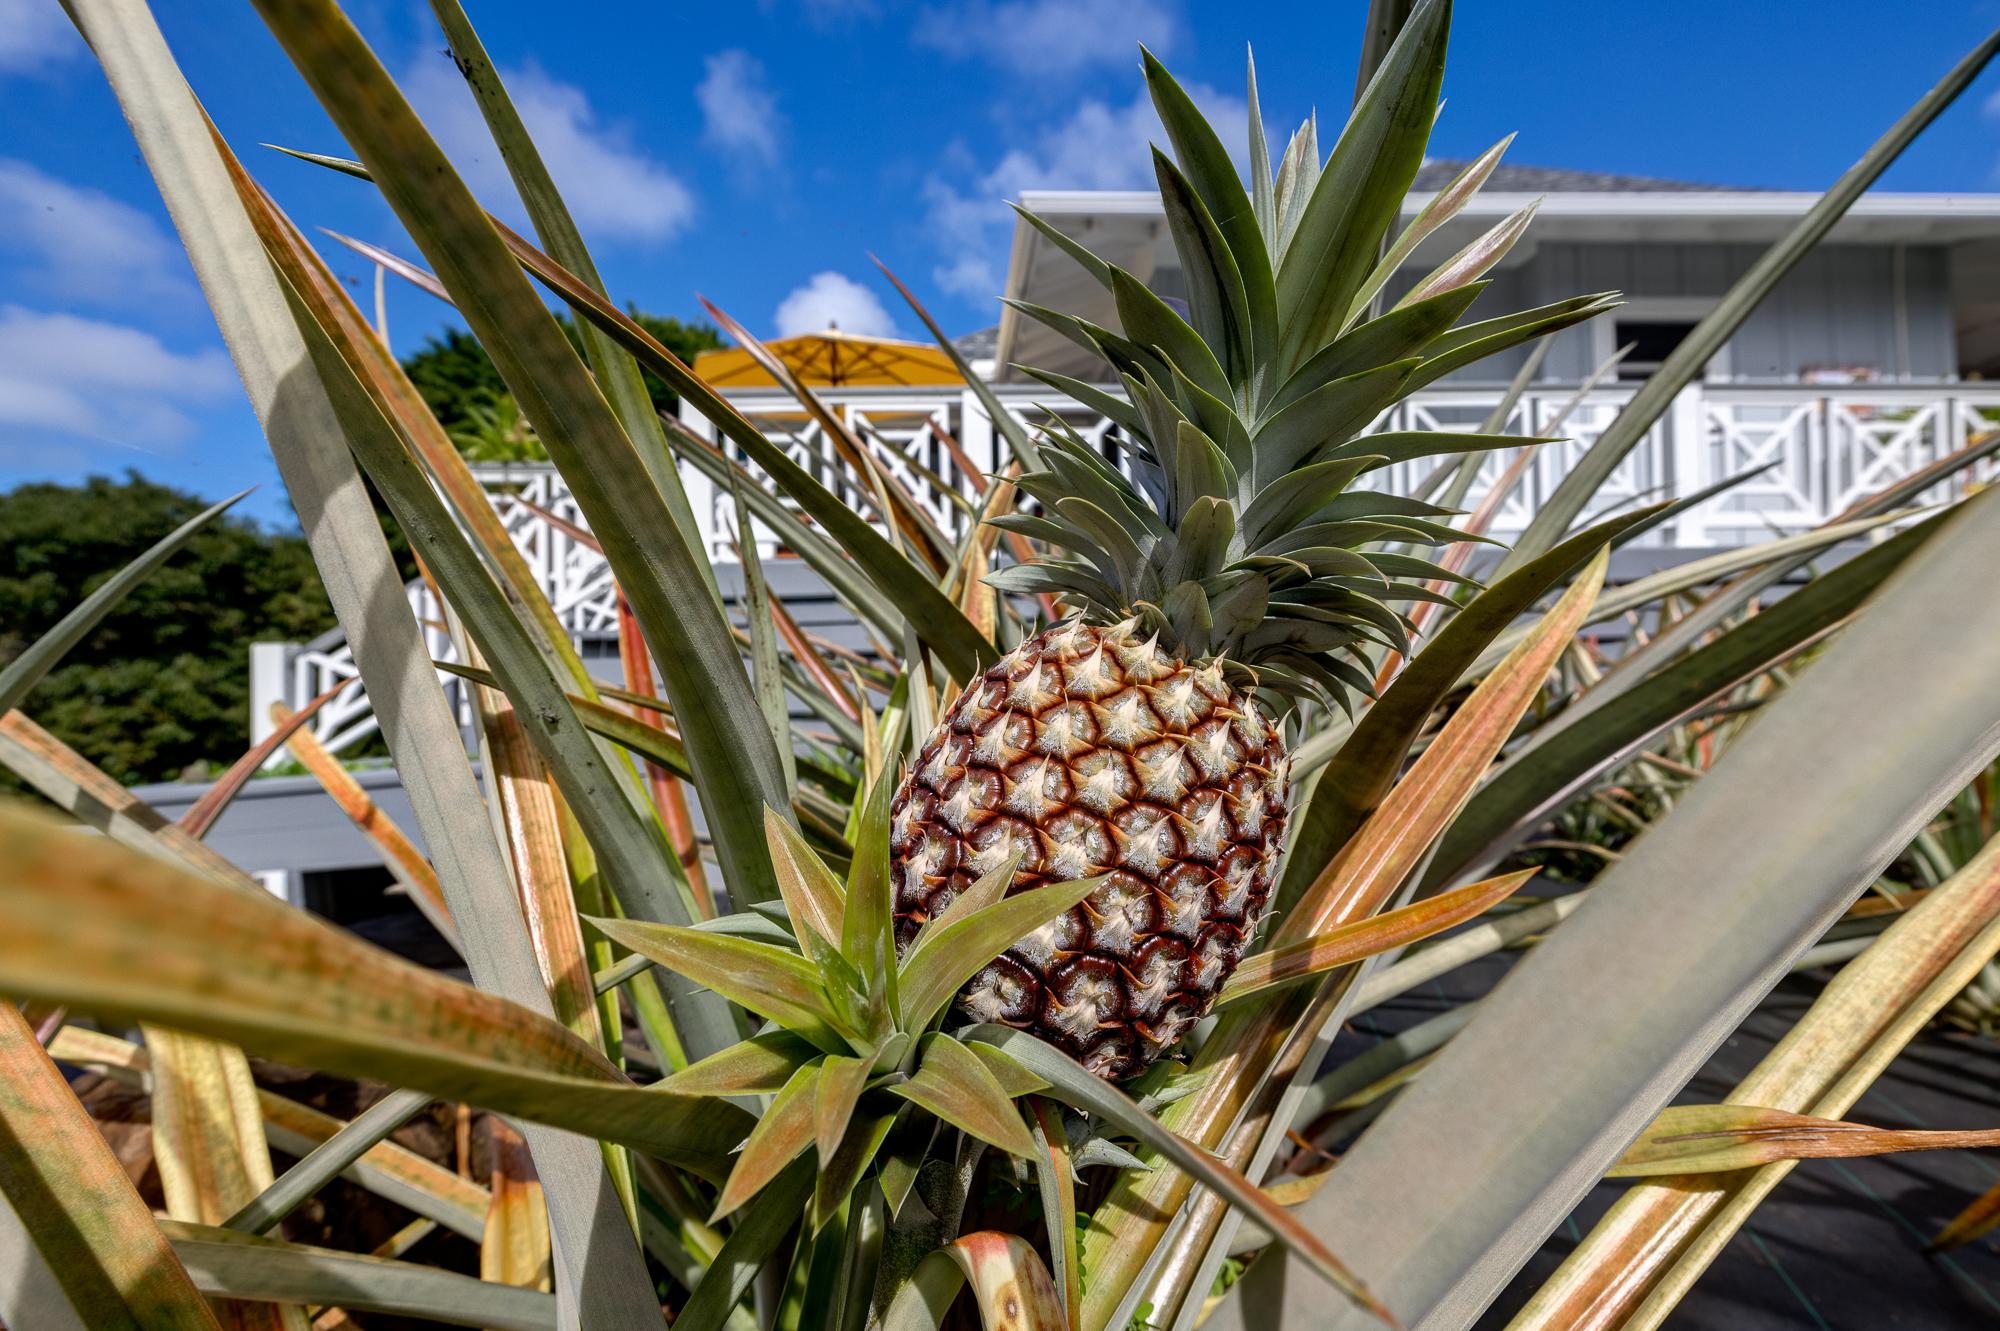 pineapple farm 7475-E Koolau Road in kauai hawaii luxury home